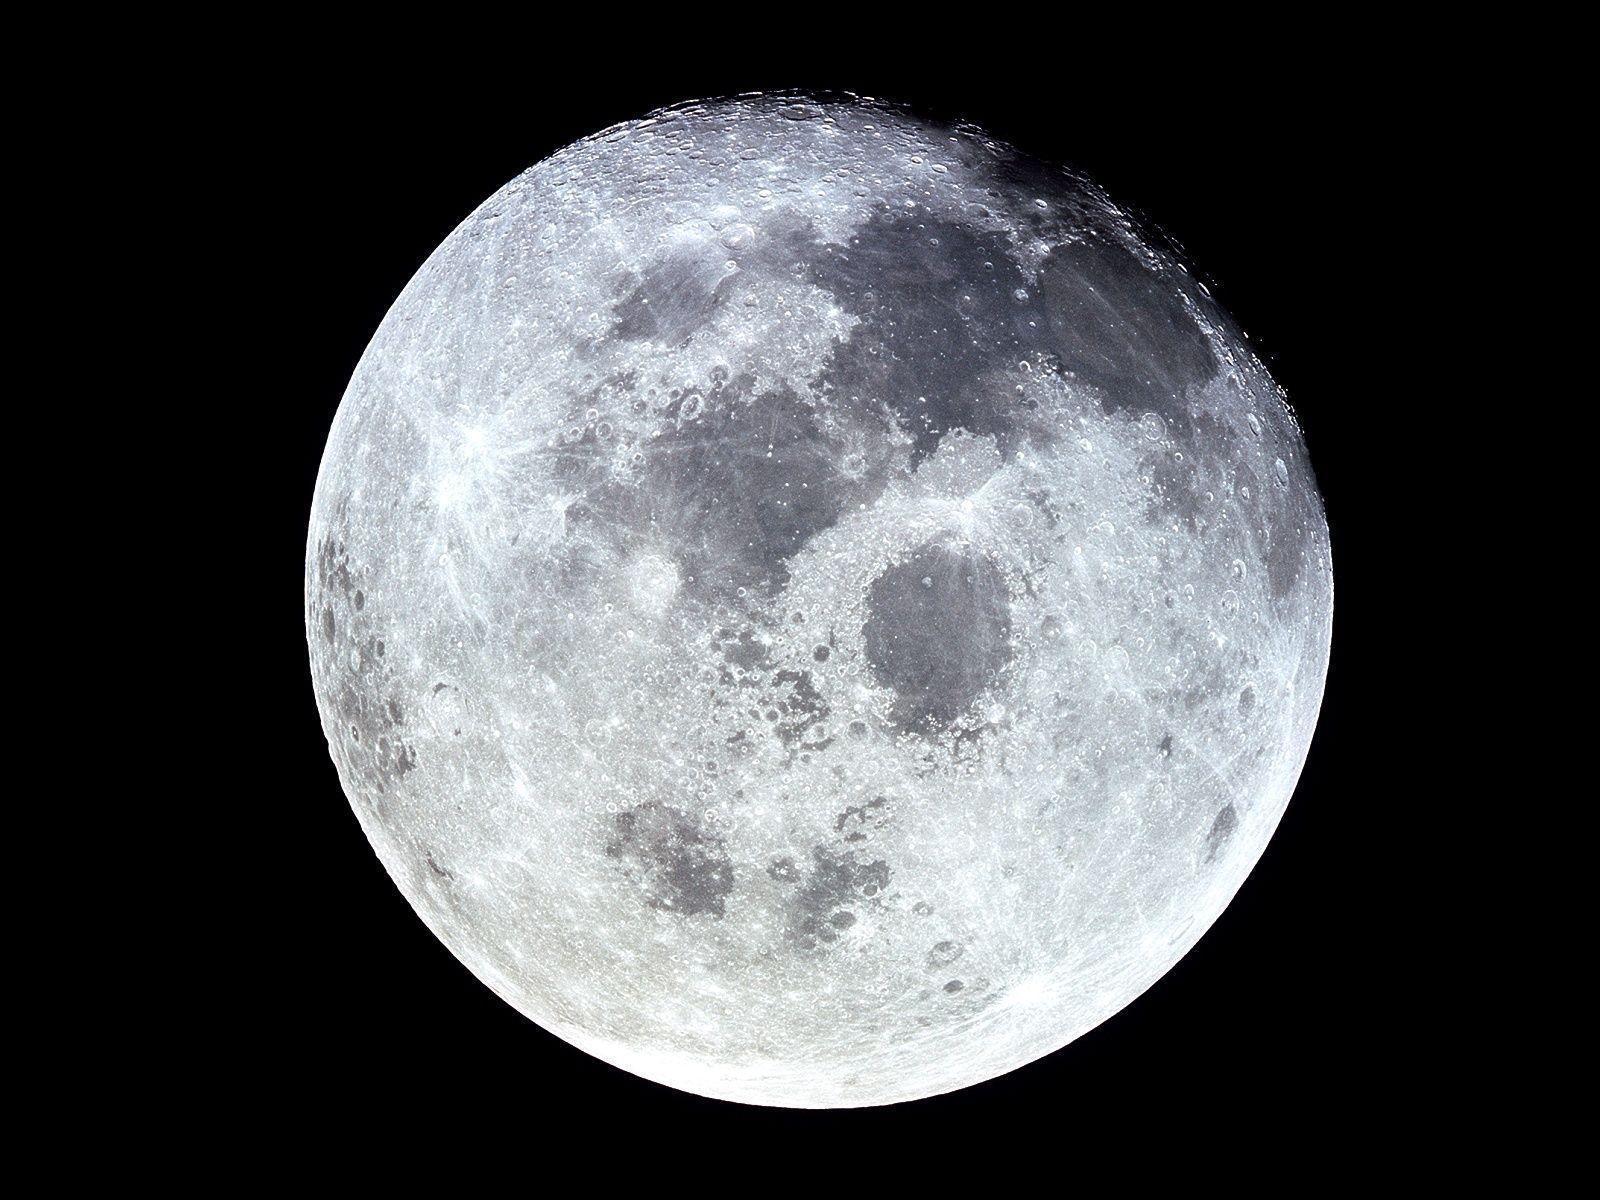 Full Moon Wallpaper 1600x1200PX ~ Full Moon #161910